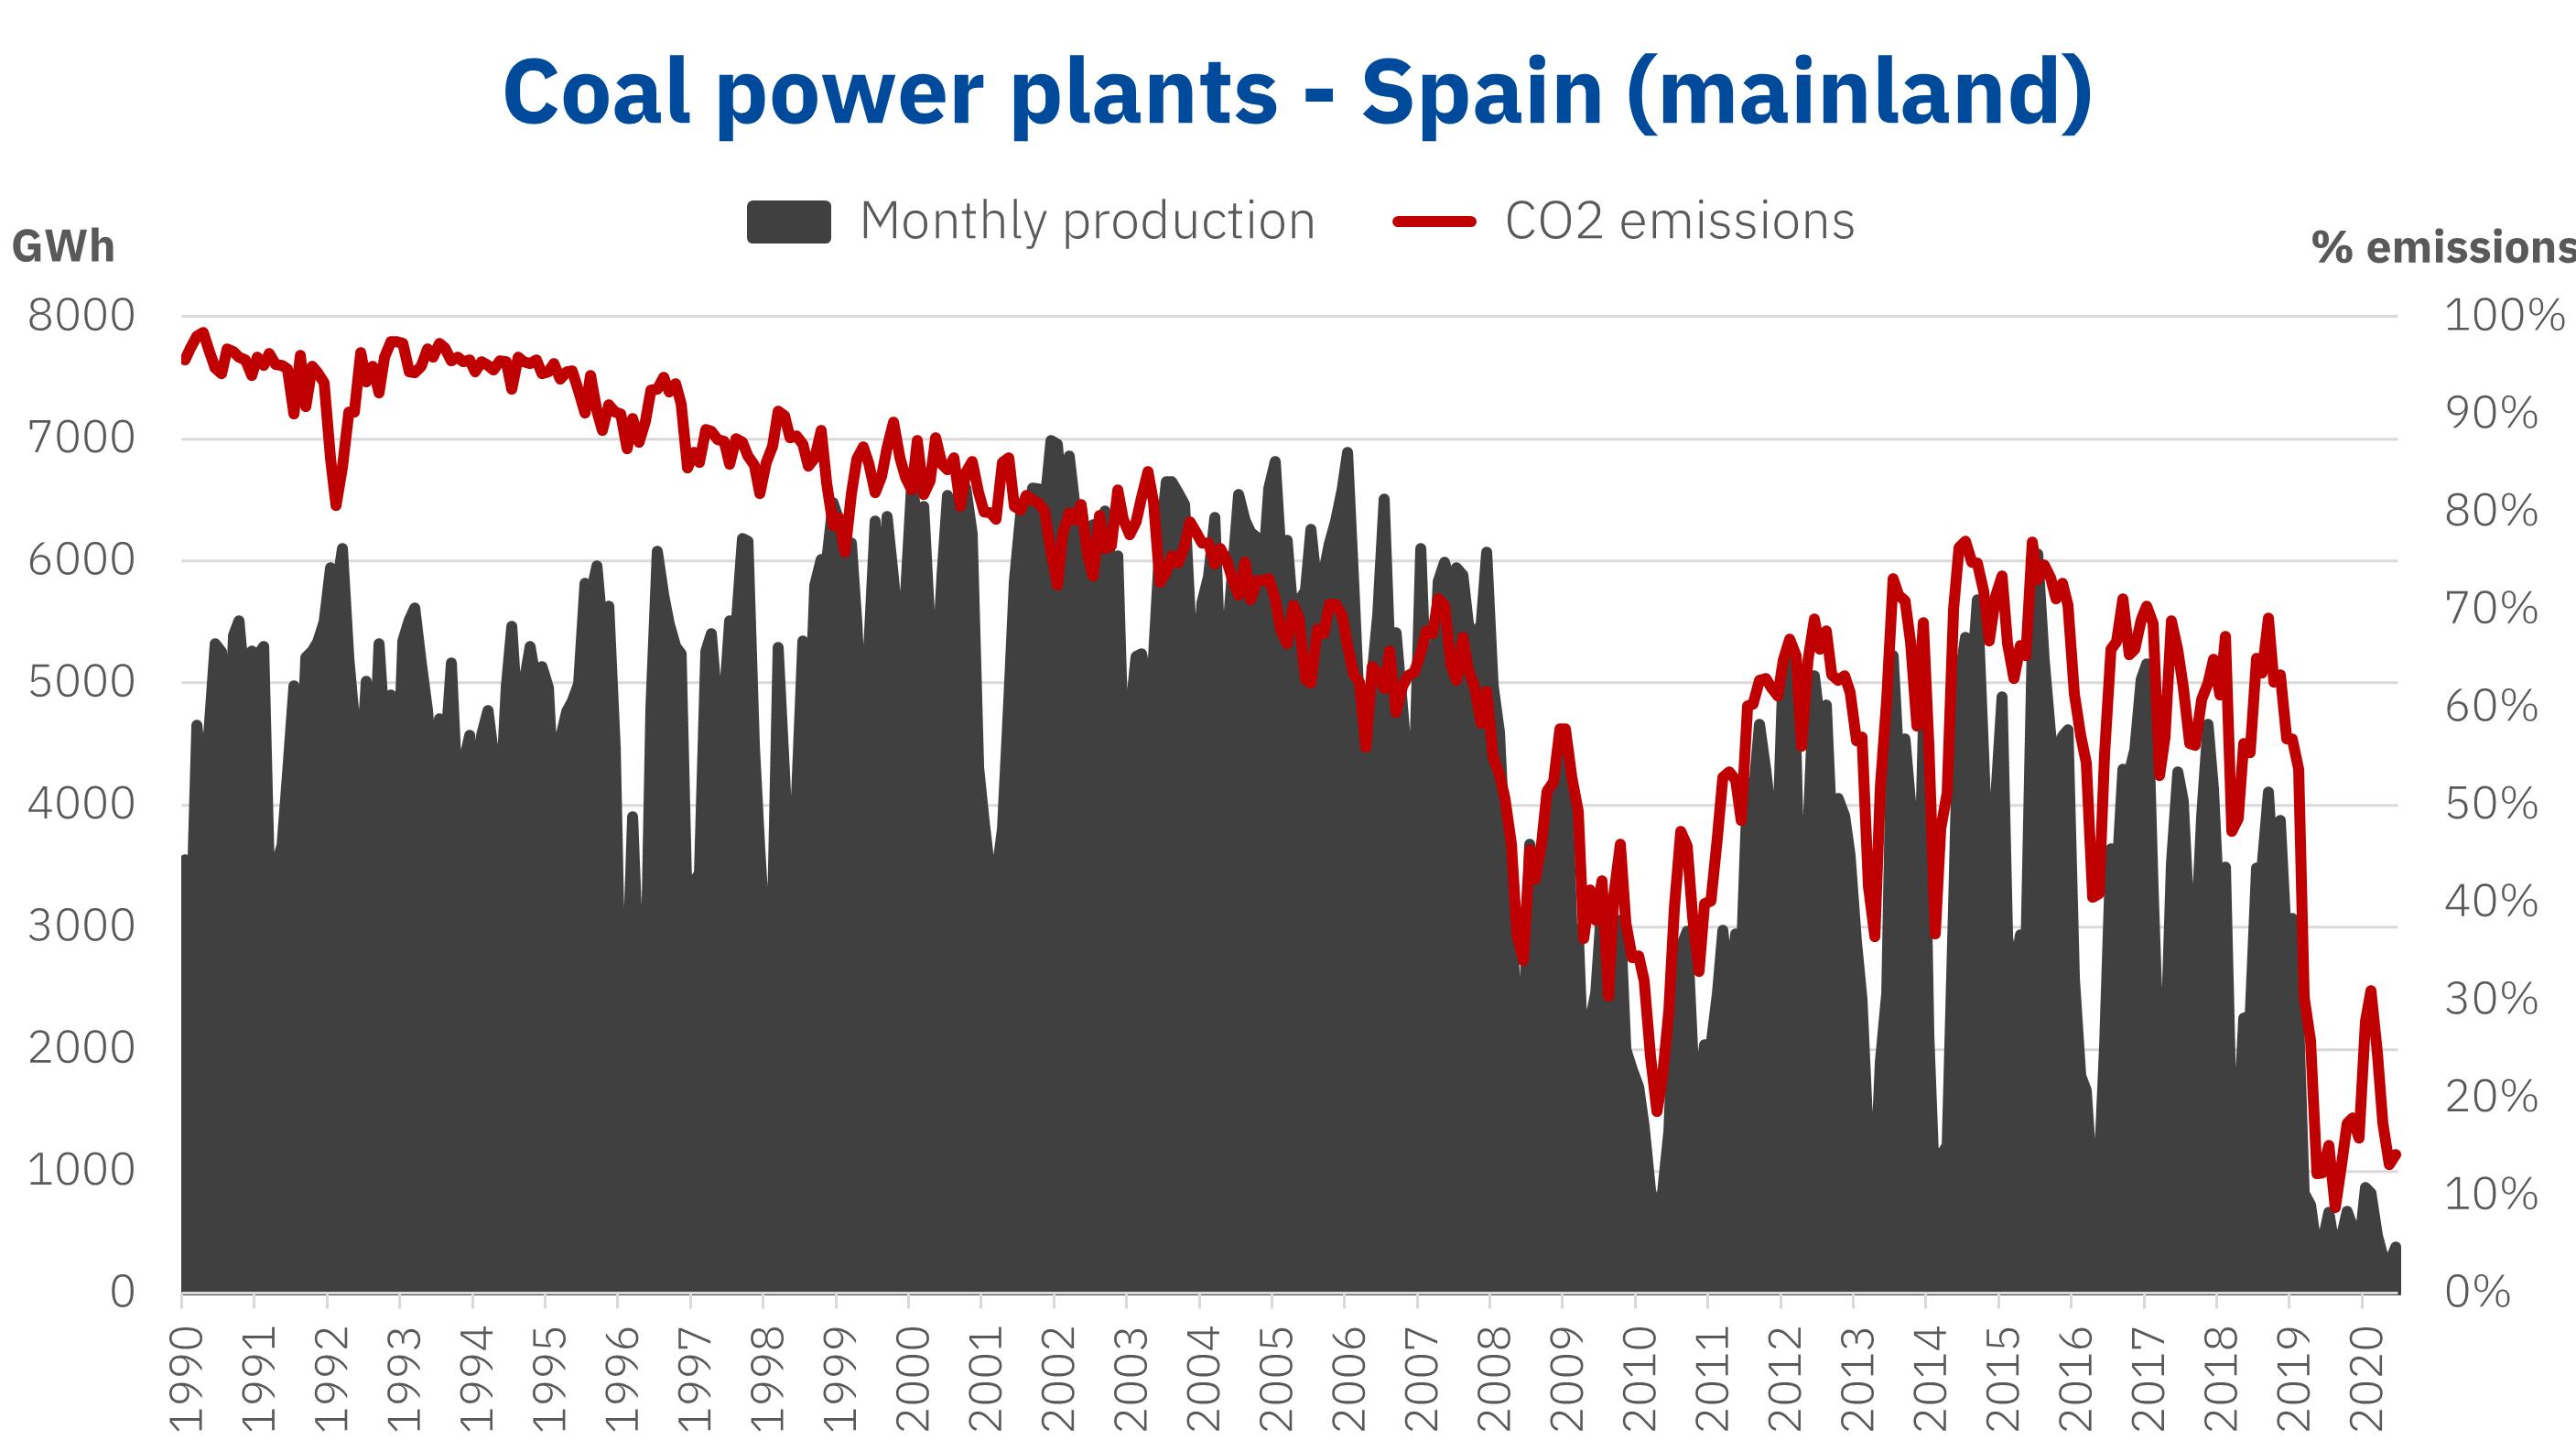 AleaSoft - Coal production CO2 emissions Spain